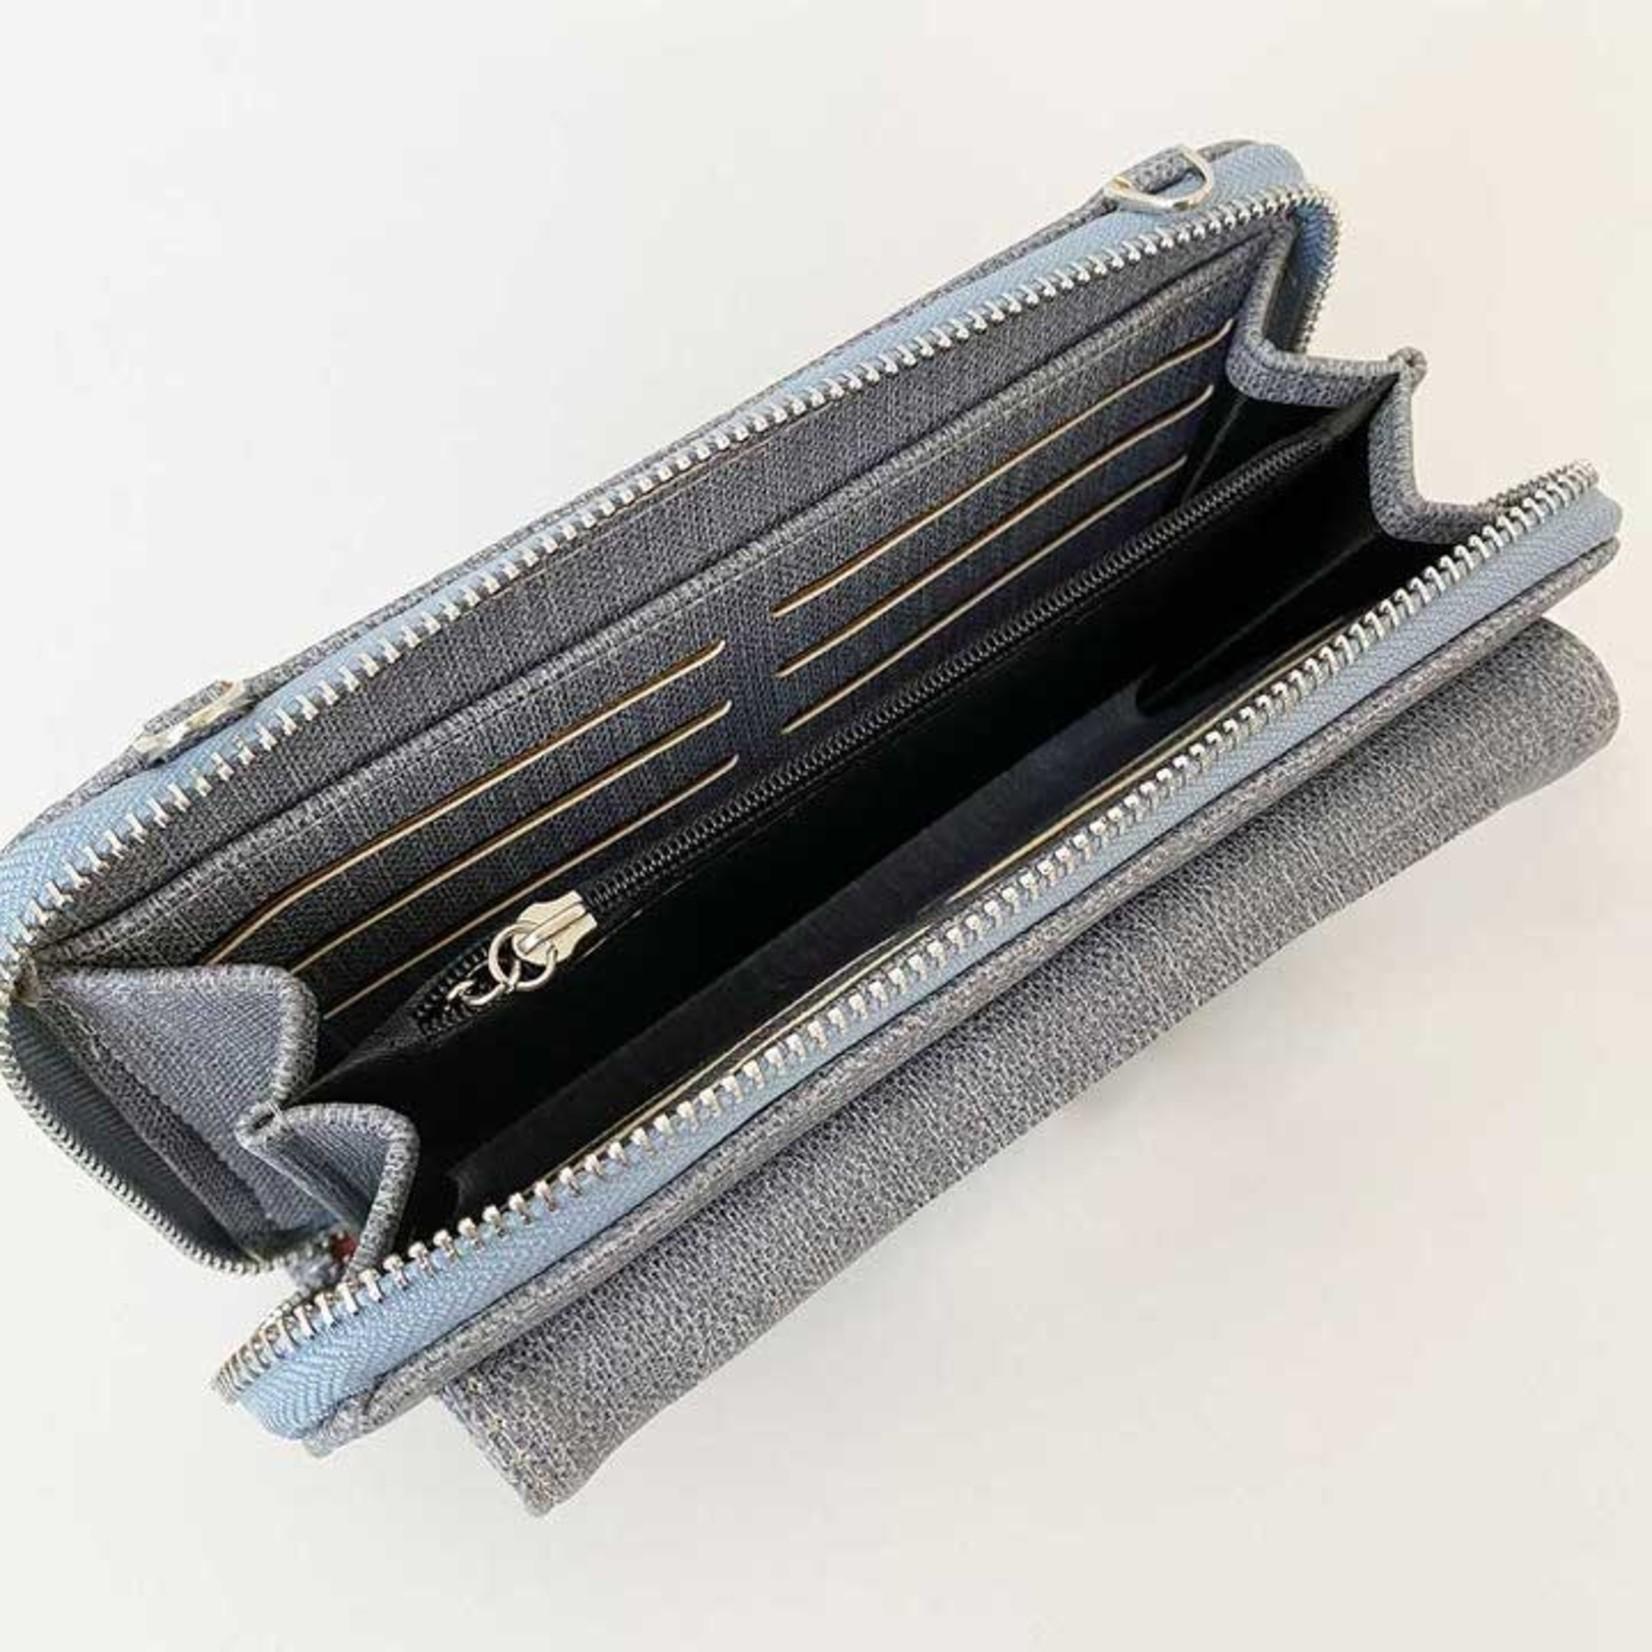 Caracol Clutch 2 in 1 Wallet/Purse